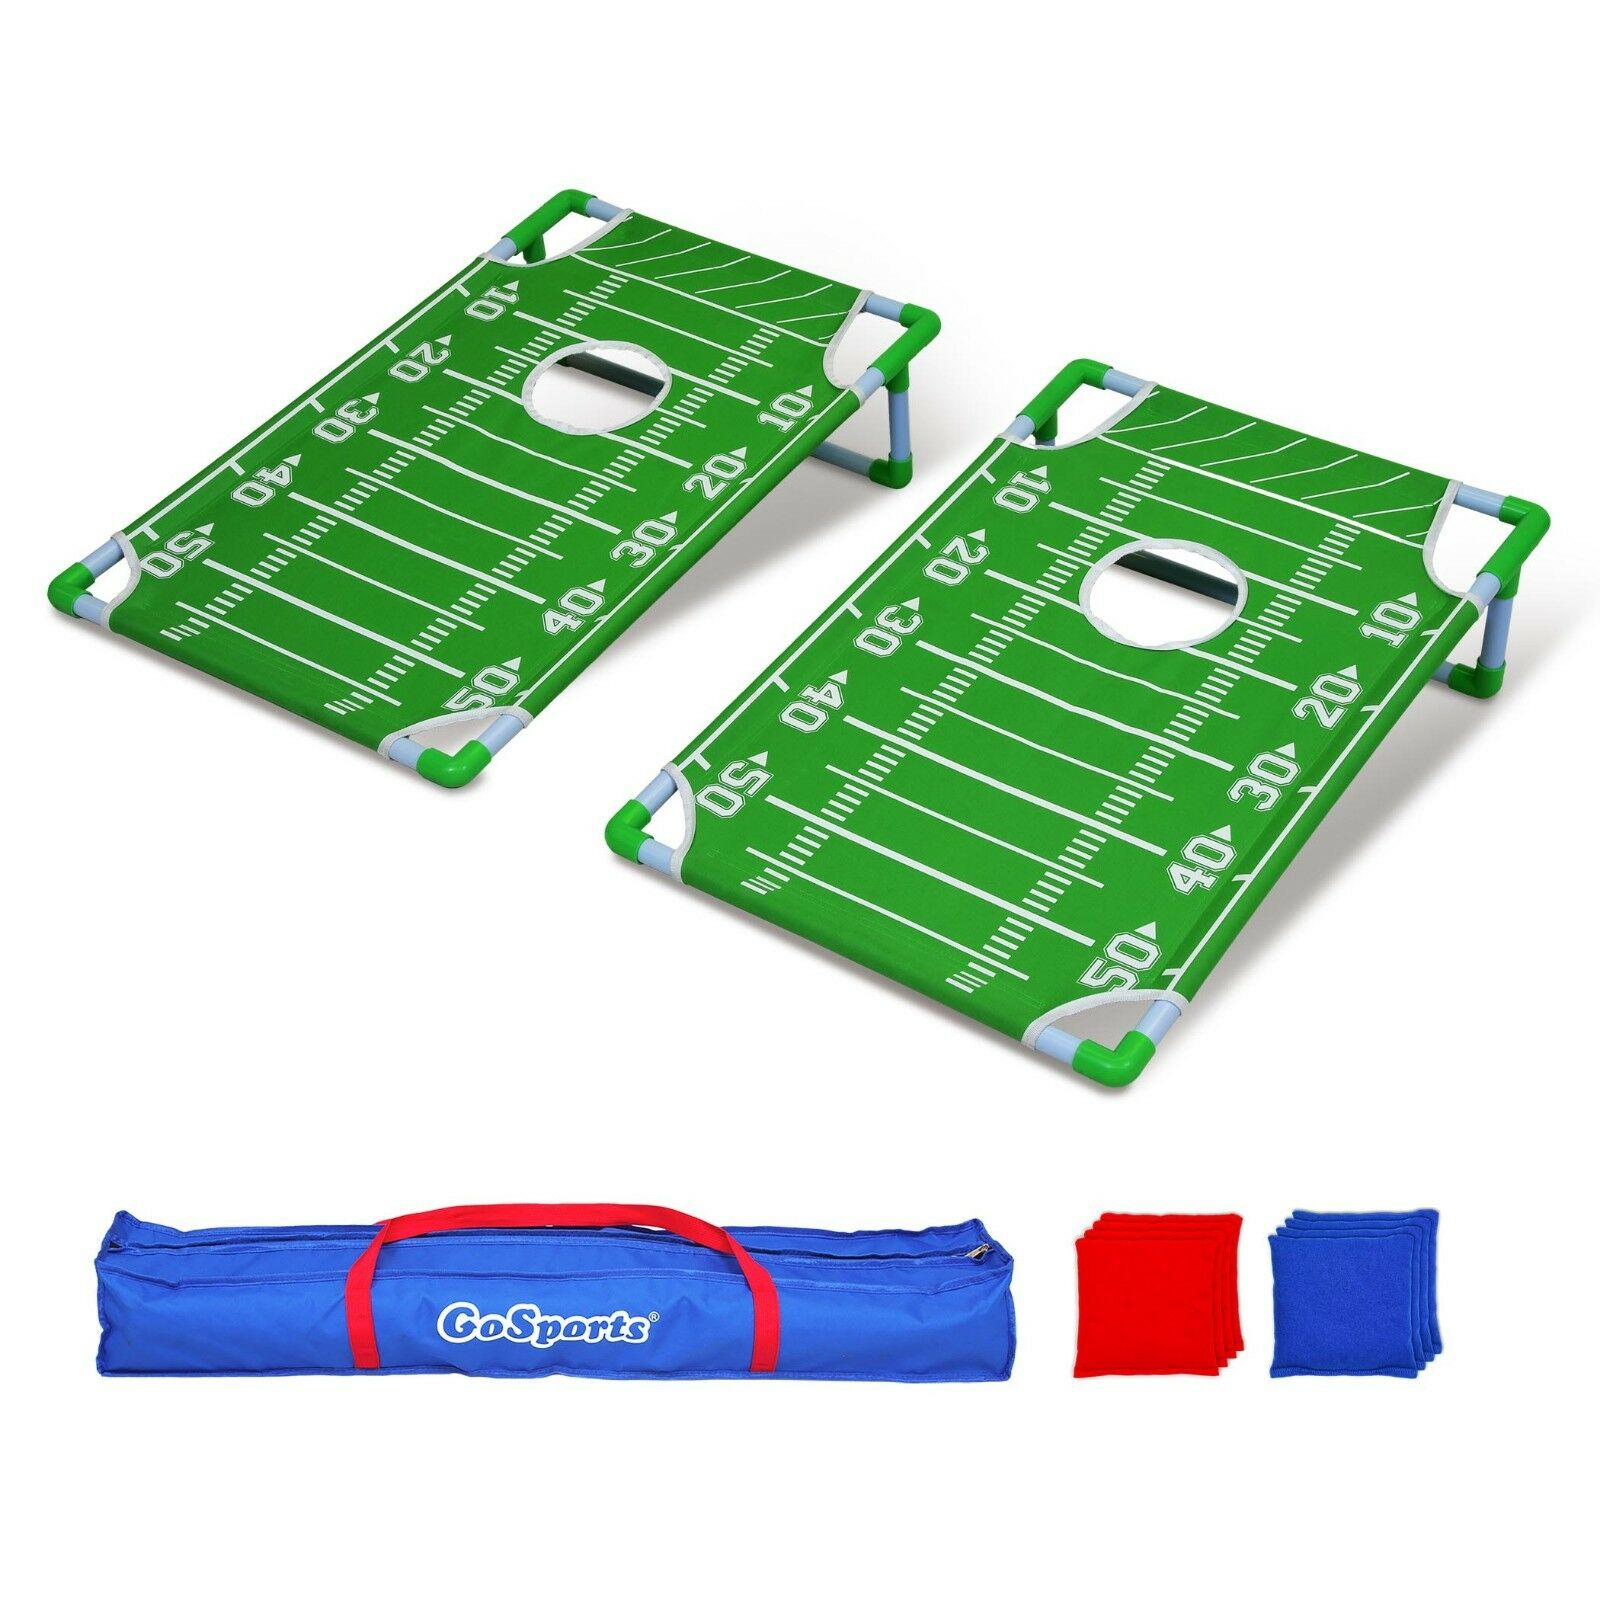 GoSports Portable PVC Frame Football Cornhole Game Set with 8 Bean Bags and Case